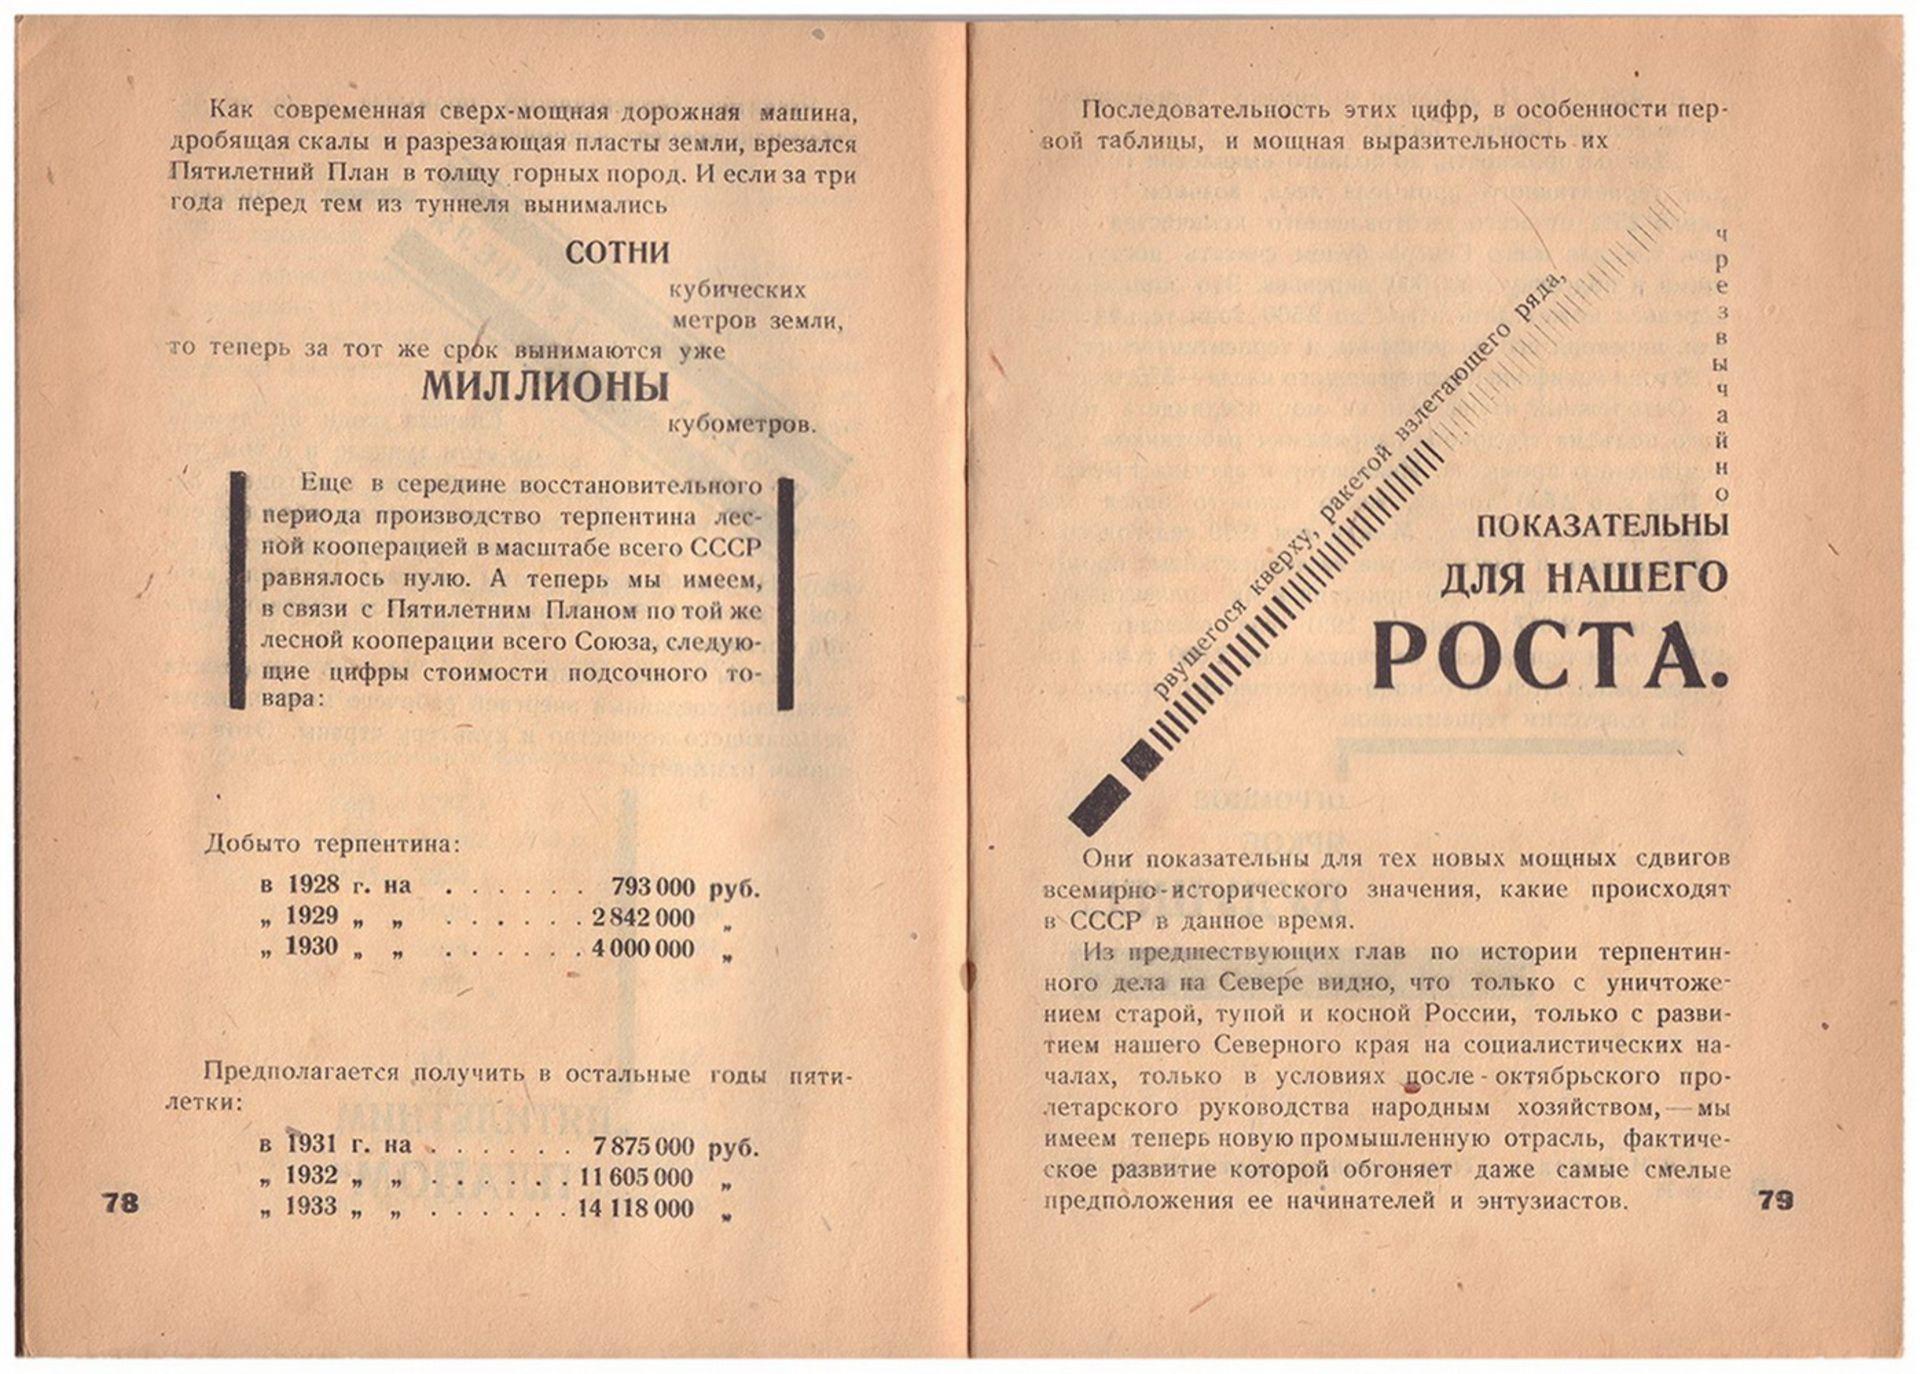 [Soviet art]. Ievlev, S. Our north Turpentine / S.F. Ievlev. - Arkhangelsk, 1931. - 80 pp.: ill.; 29 - Bild 6 aus 6